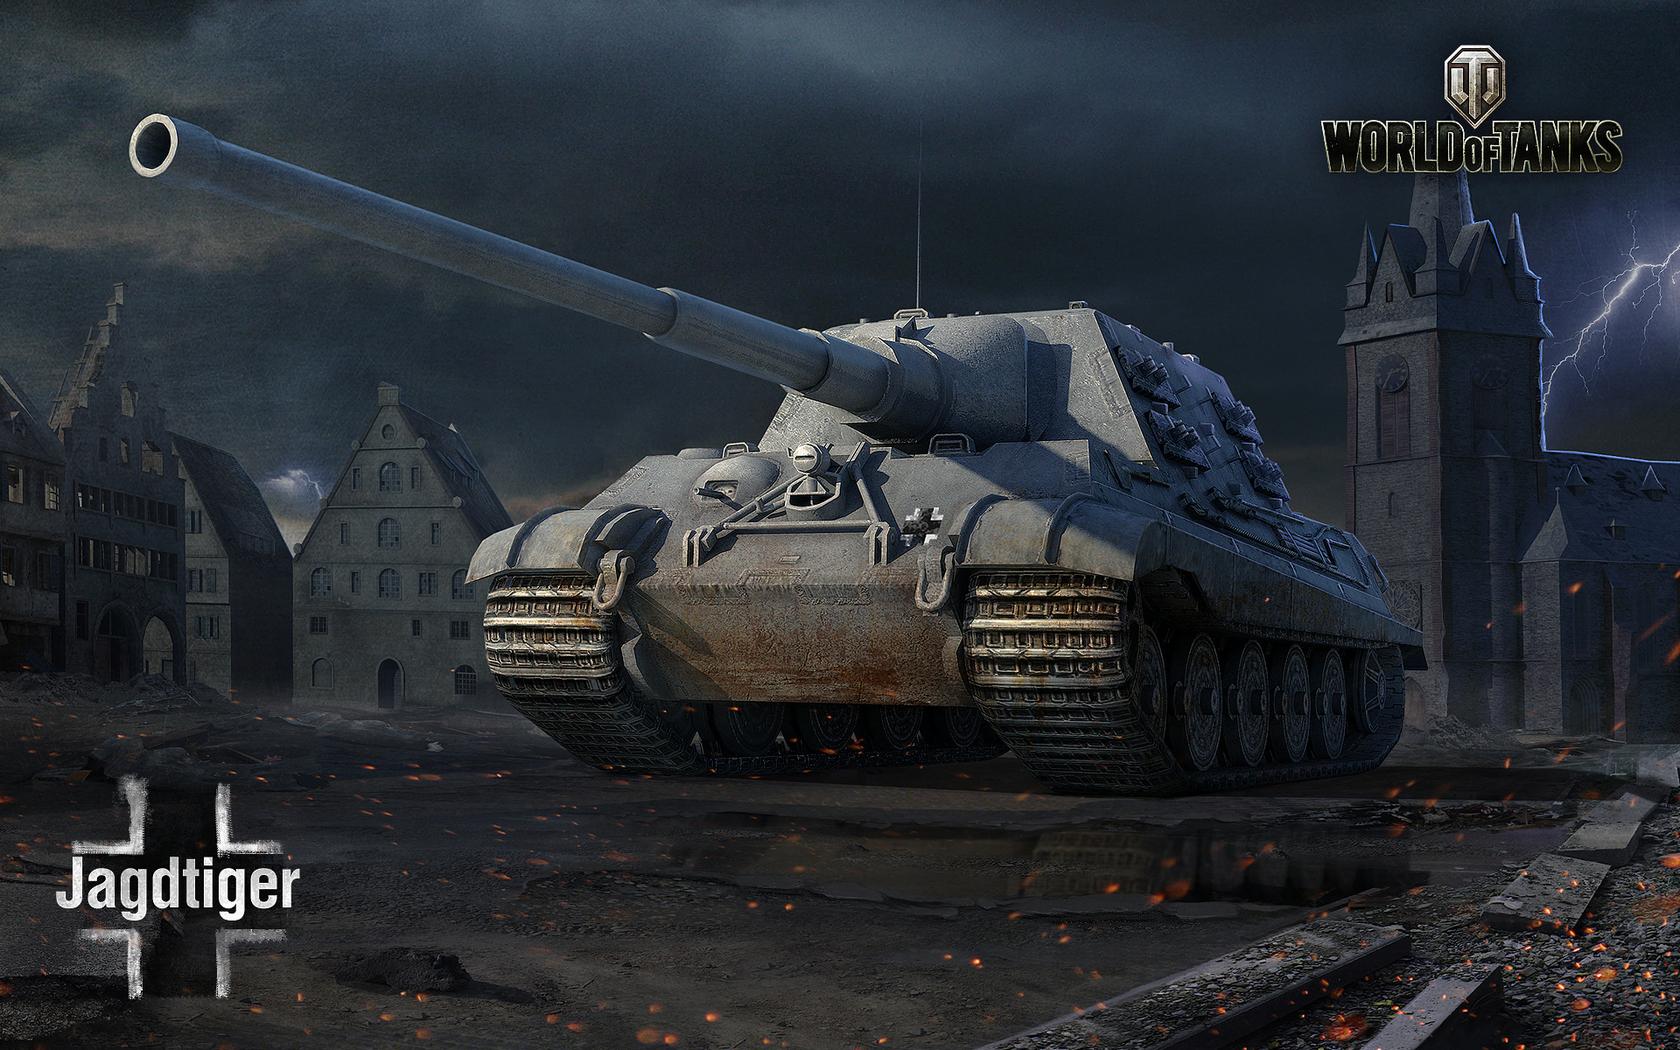 скачать танки онлайн на рабочий стол картинки